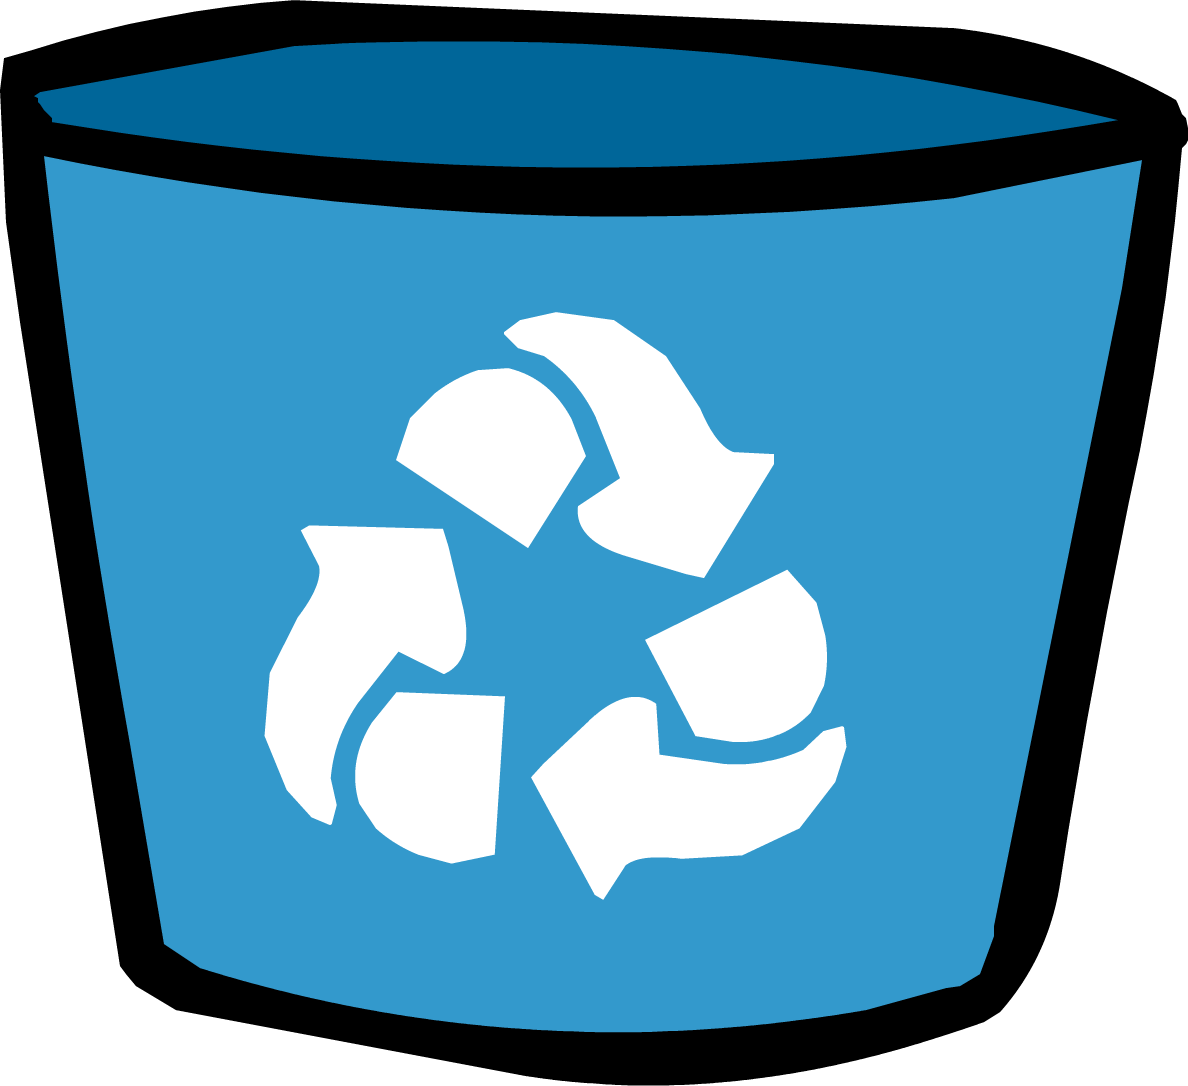 Recycle Bin Club Penguin Wiki Fandom Powered By Wikia